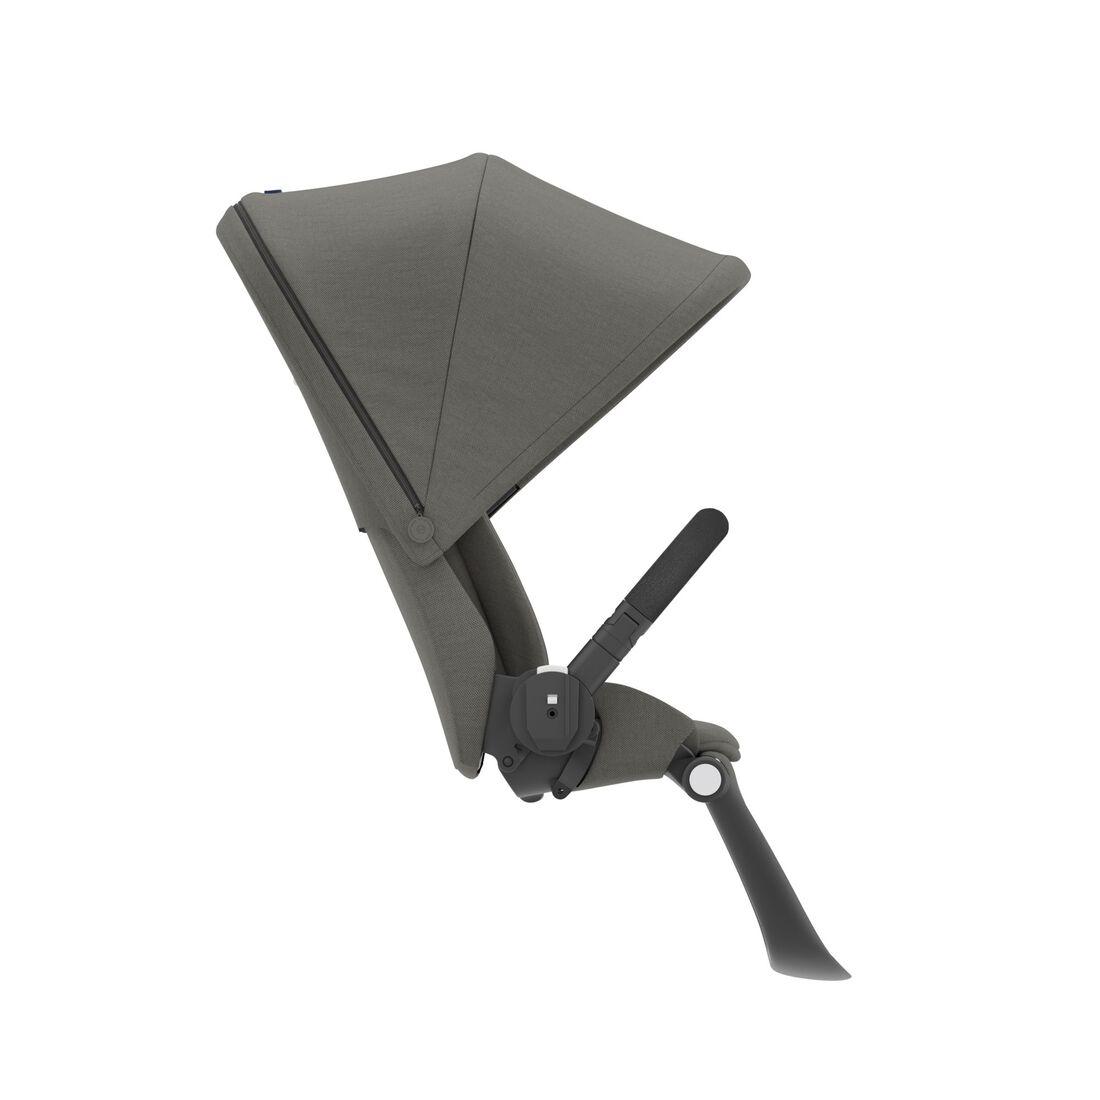 CYBEX Gazelle S Sitzeinheit - Soho Grey (Schwarzer Rahmen) in Soho Grey (Black Frame) large Bild 2